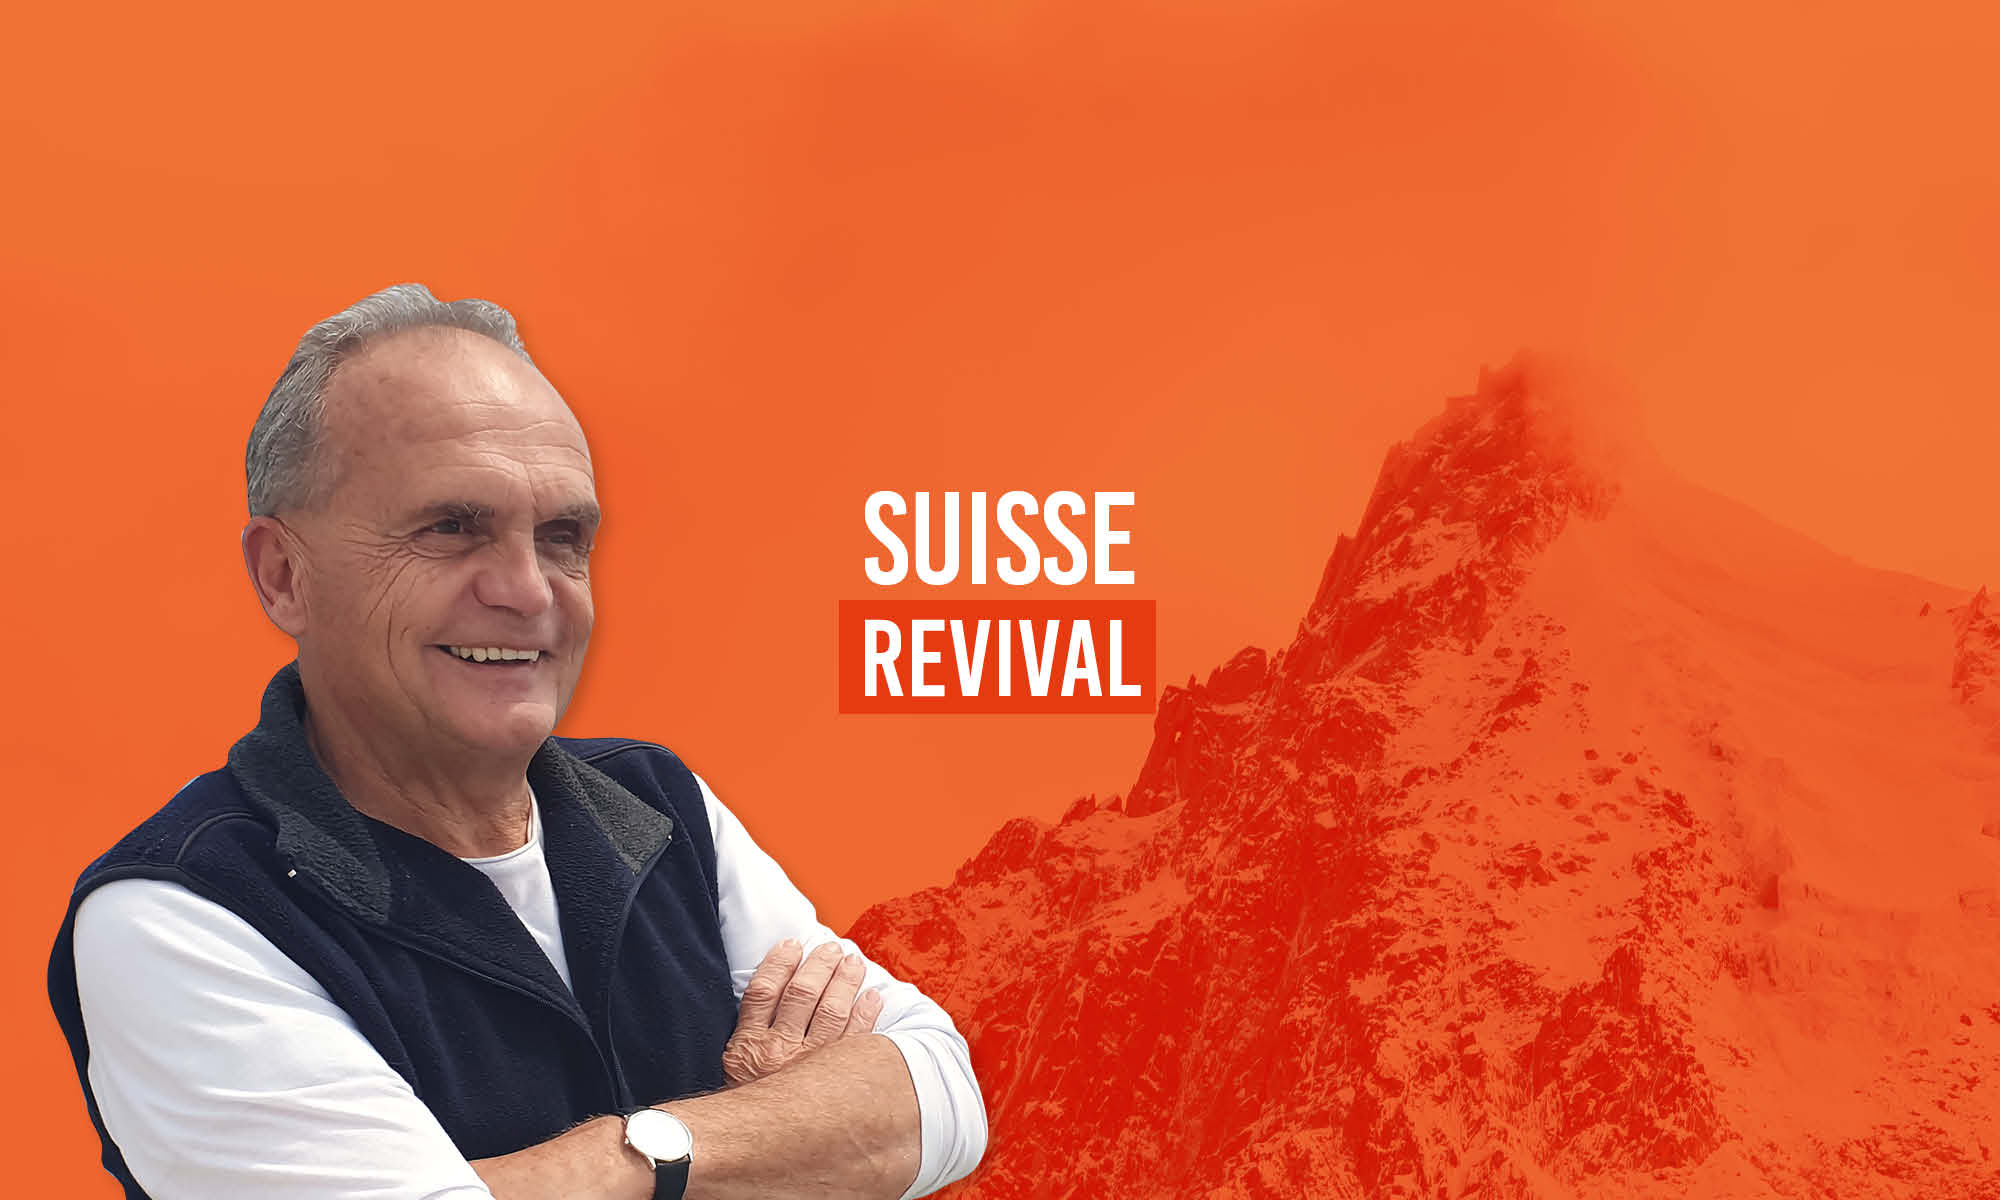 Suisse Revival